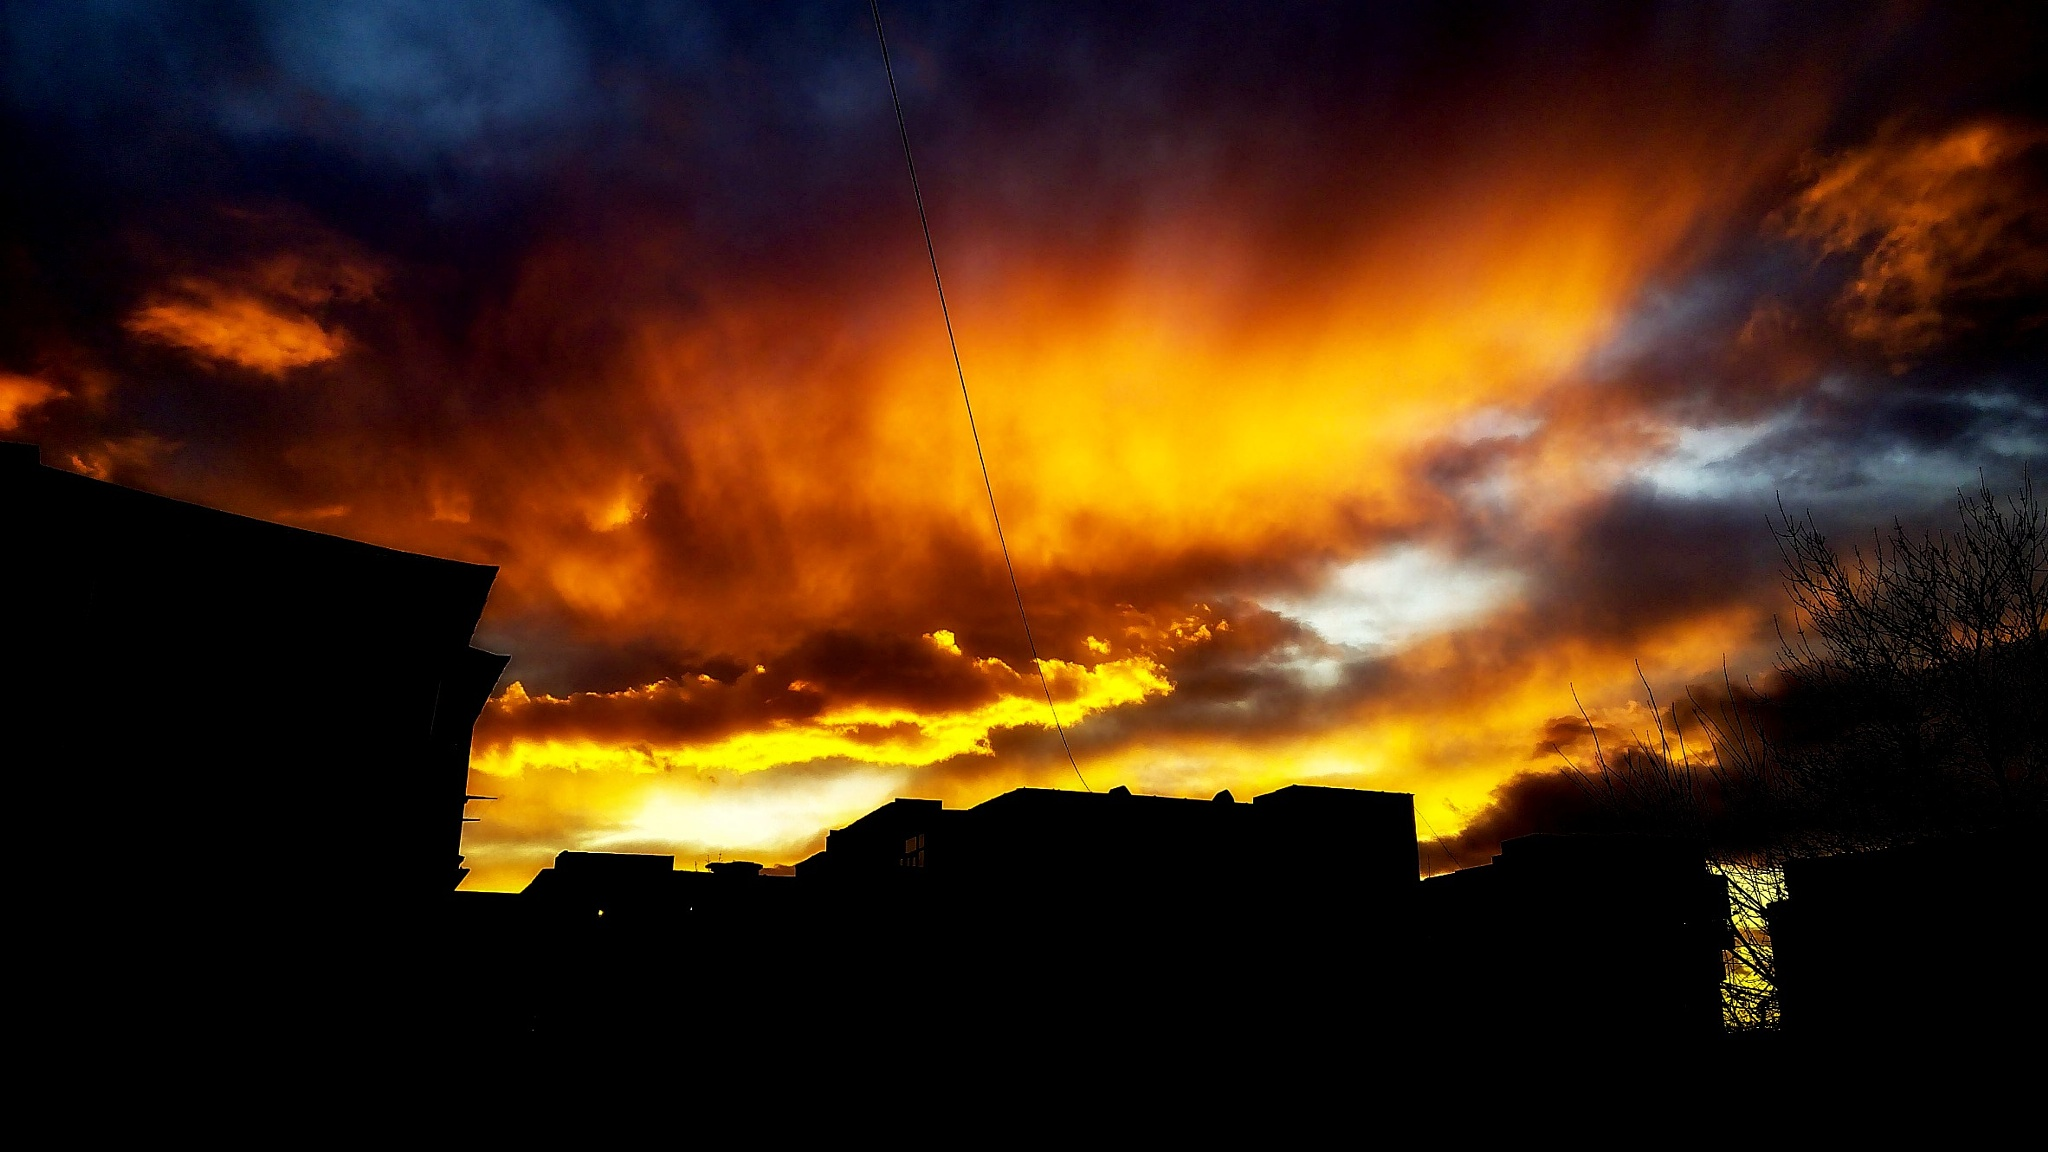 Sunset by Bogdan Berbec